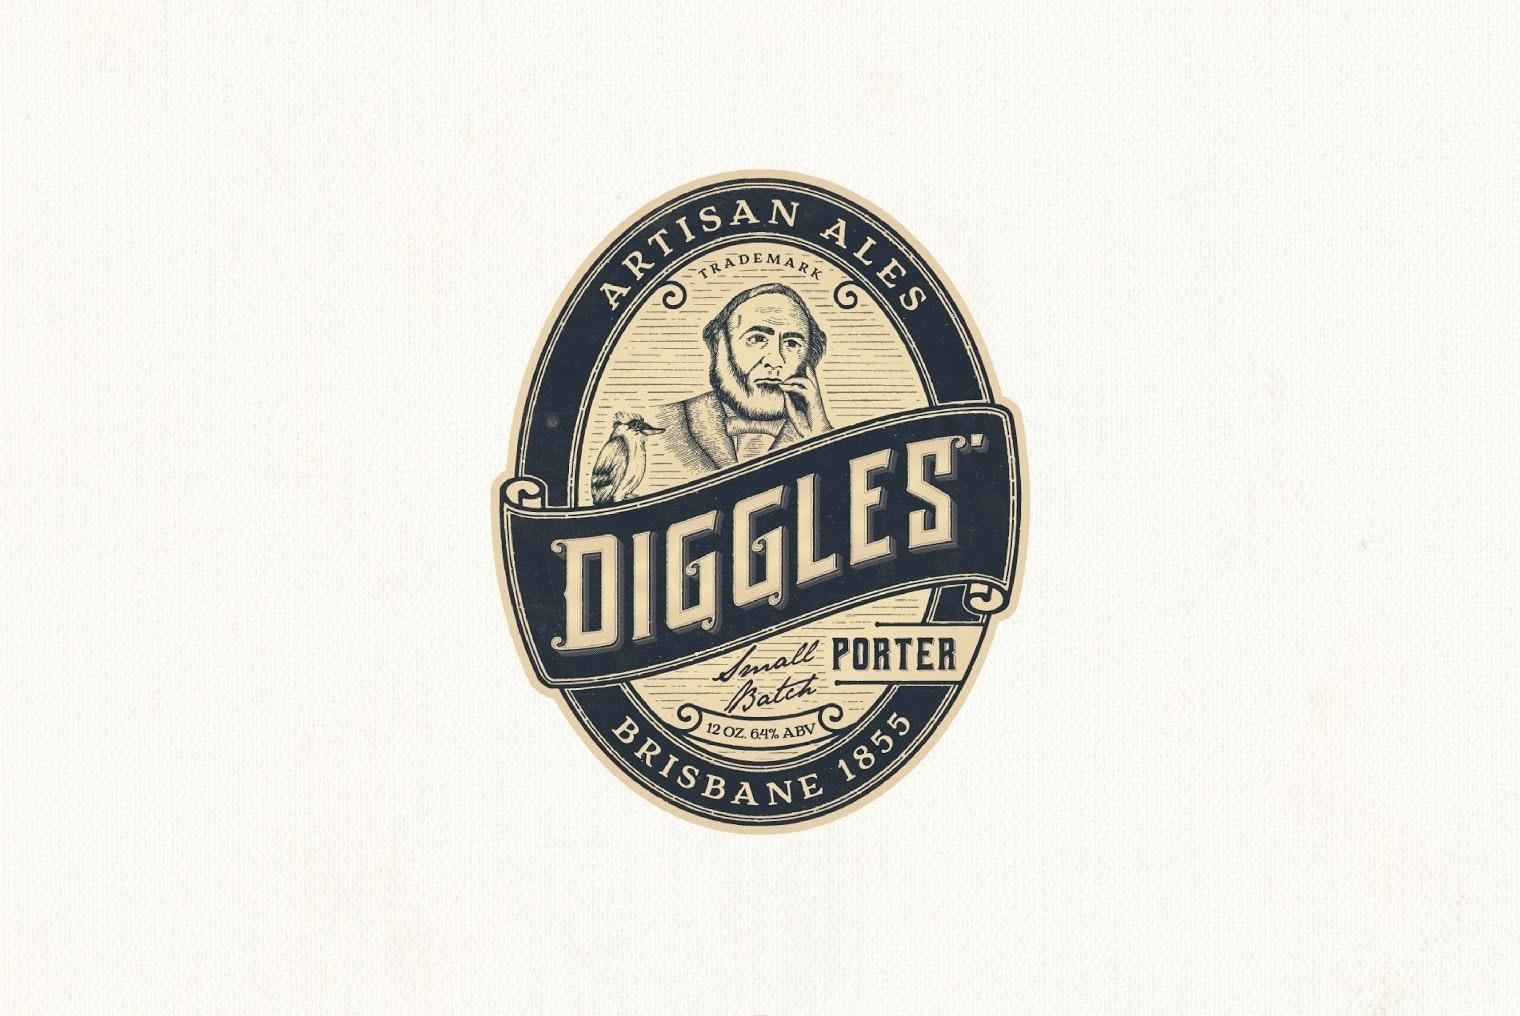 Diggles Artisan Ales logo